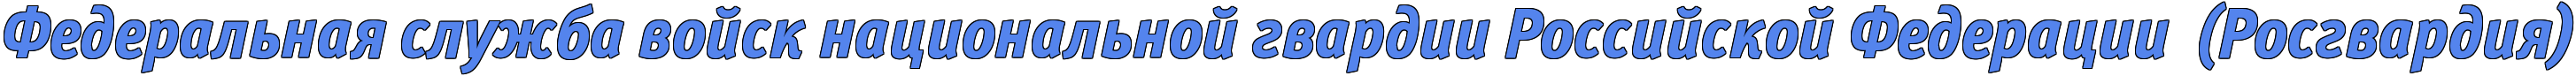 http://x-lines.ru/letters/i/cyrillicbasic/0436/5484ed/60/1/4n1pbpqosuemmwcy4napbq6ttuem5wfo4g81bwcb4n77dy6os5emdwfordemfwf64nh7dyqozeopbxqosdeapwfa4n9pbxqosdemzwcc4n67bxsozropbc6osmembwcy4n4pbqgozyopbegoz5eadwcb4nhpbqqto8emiwf64nh1bwfr4n47bpgoszeabwfo4gdpbqgozyonykgowdem7wcb4n37bcsosdeabwfw4nhpdd3j.png